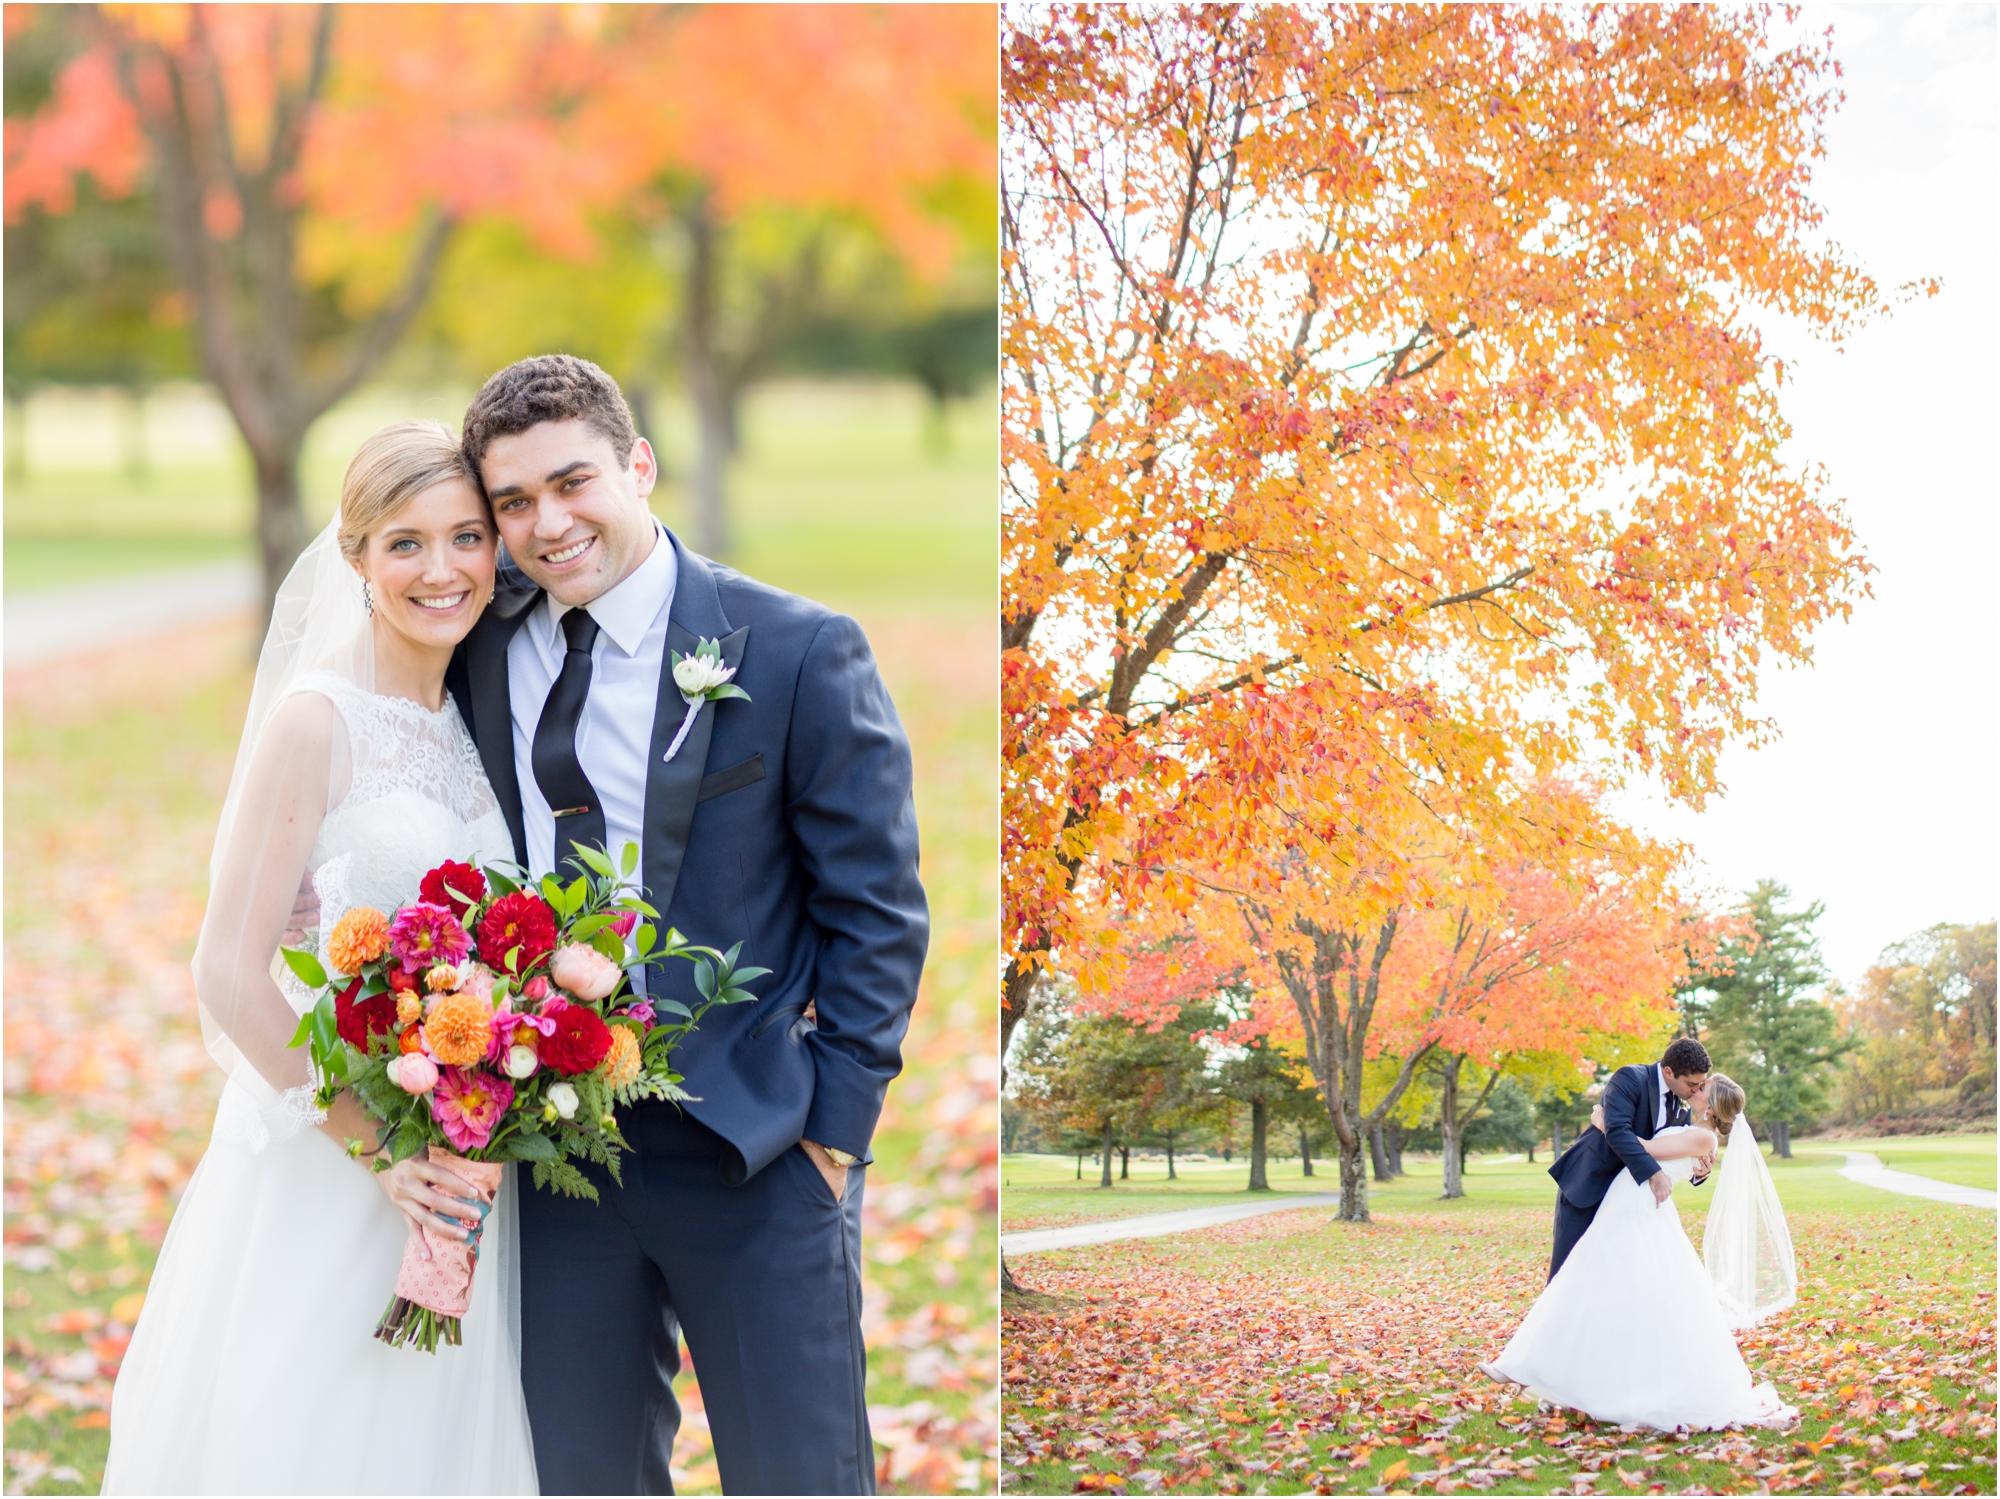 2-Finkel Wedding Bride & Groom Portraits-303_anna grace photography maryland wedding photographer turf valley.jpg